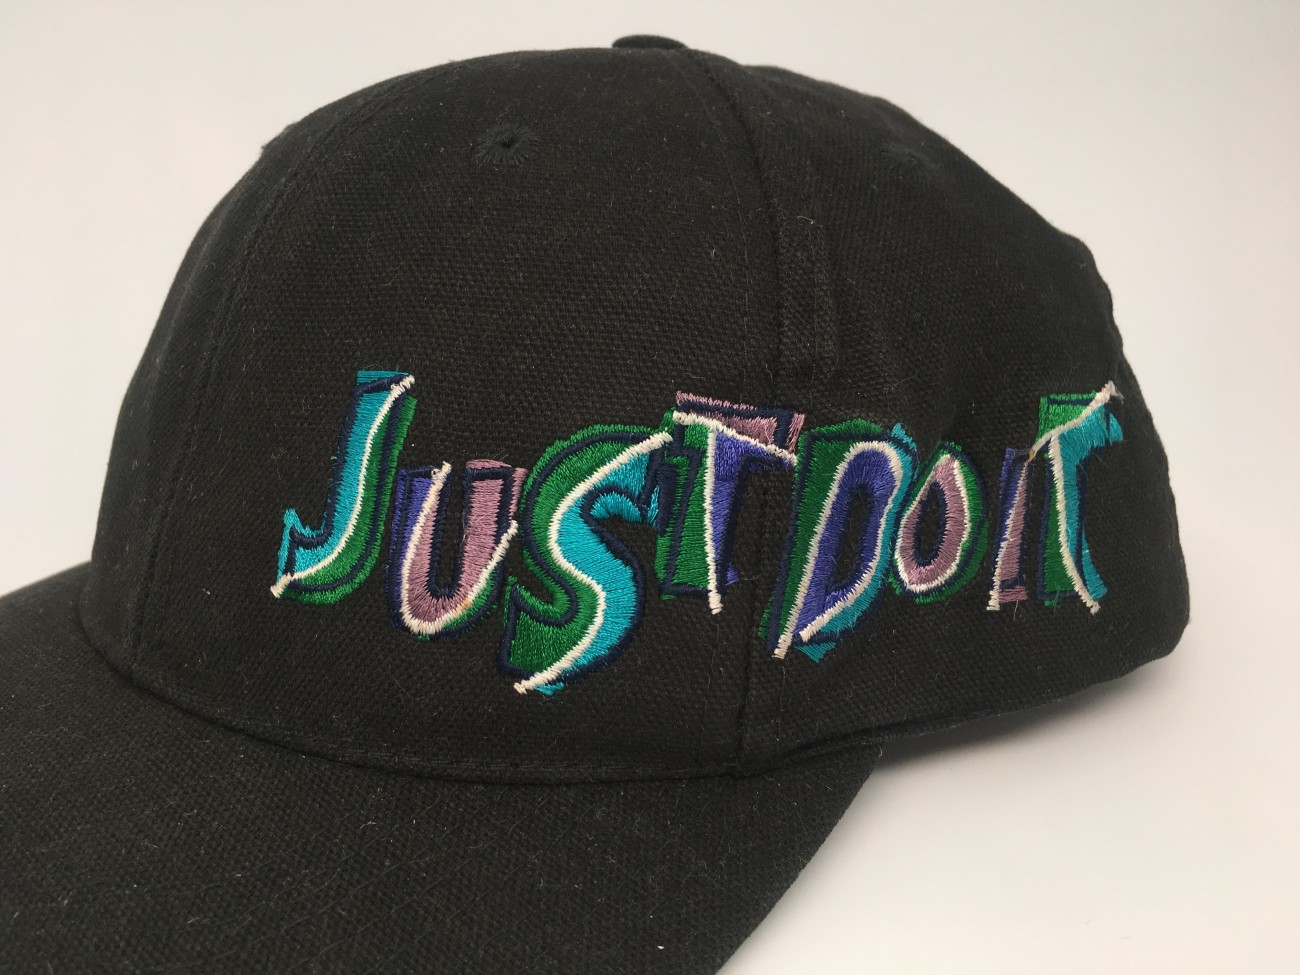 db9be1597003b Vintage 90 s Nike Just Do It snapback hat